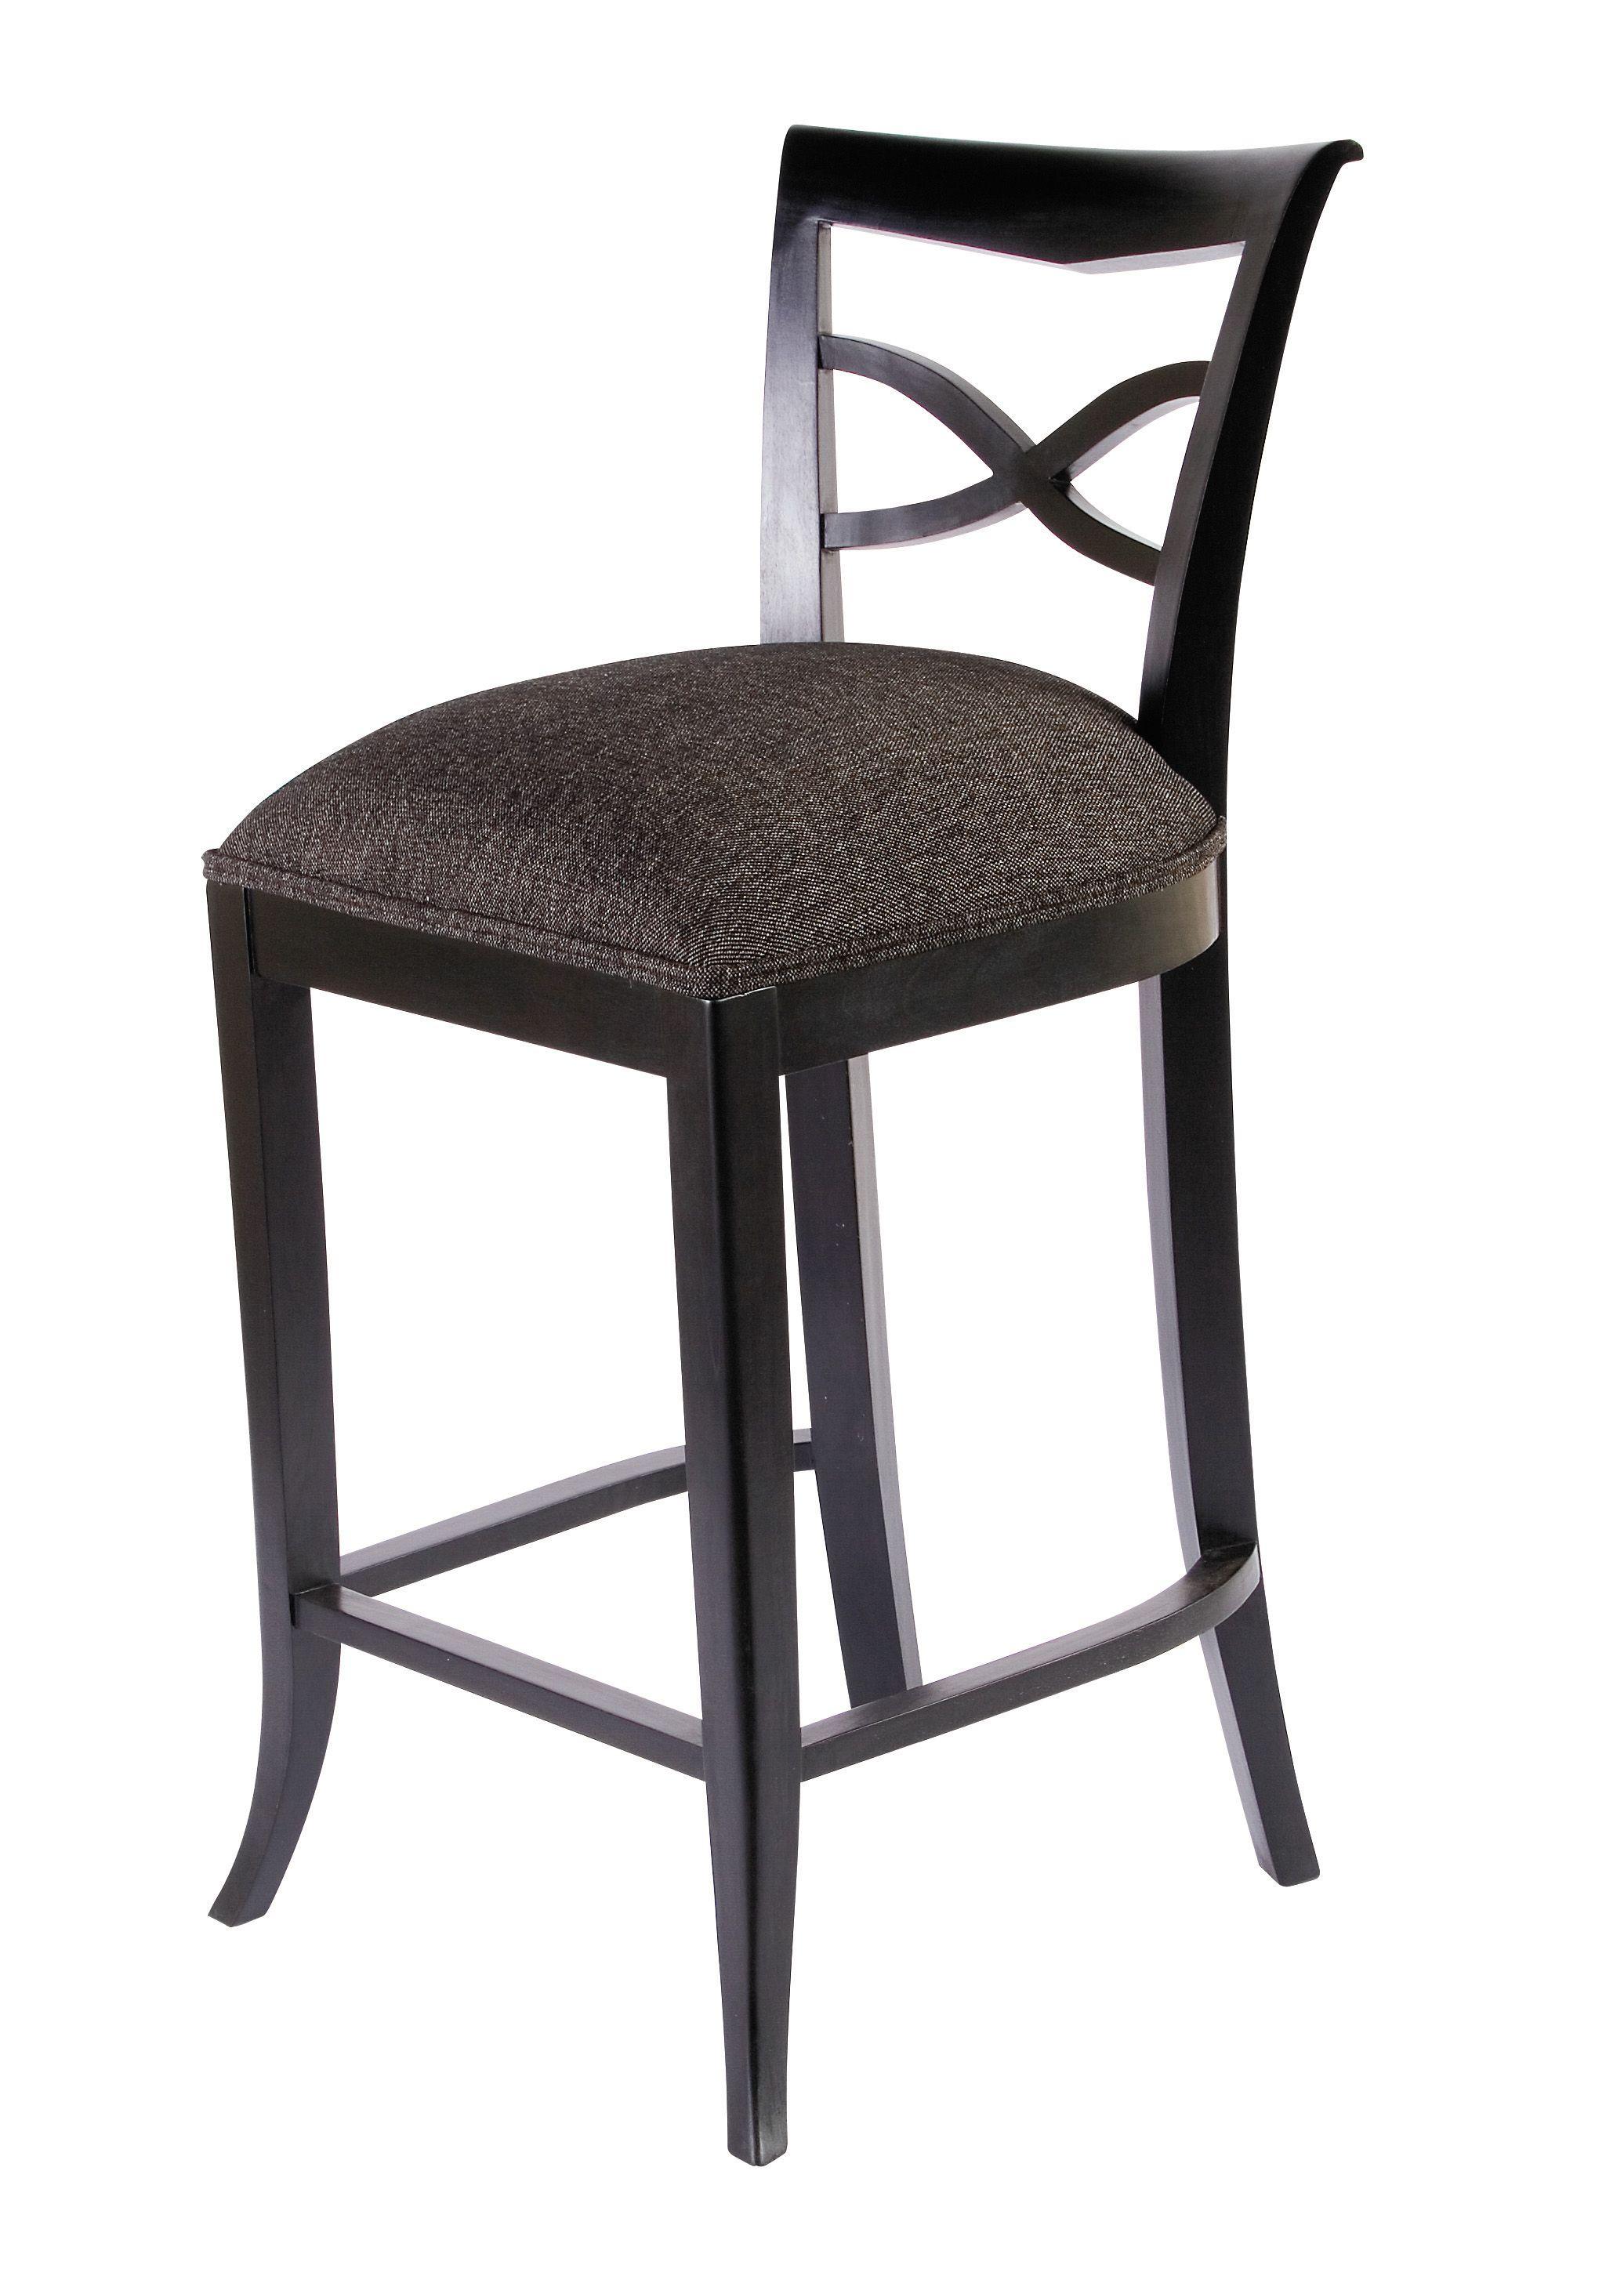 Oslo bar stool black hamptons style pinterest for Hampton style kitchen stools